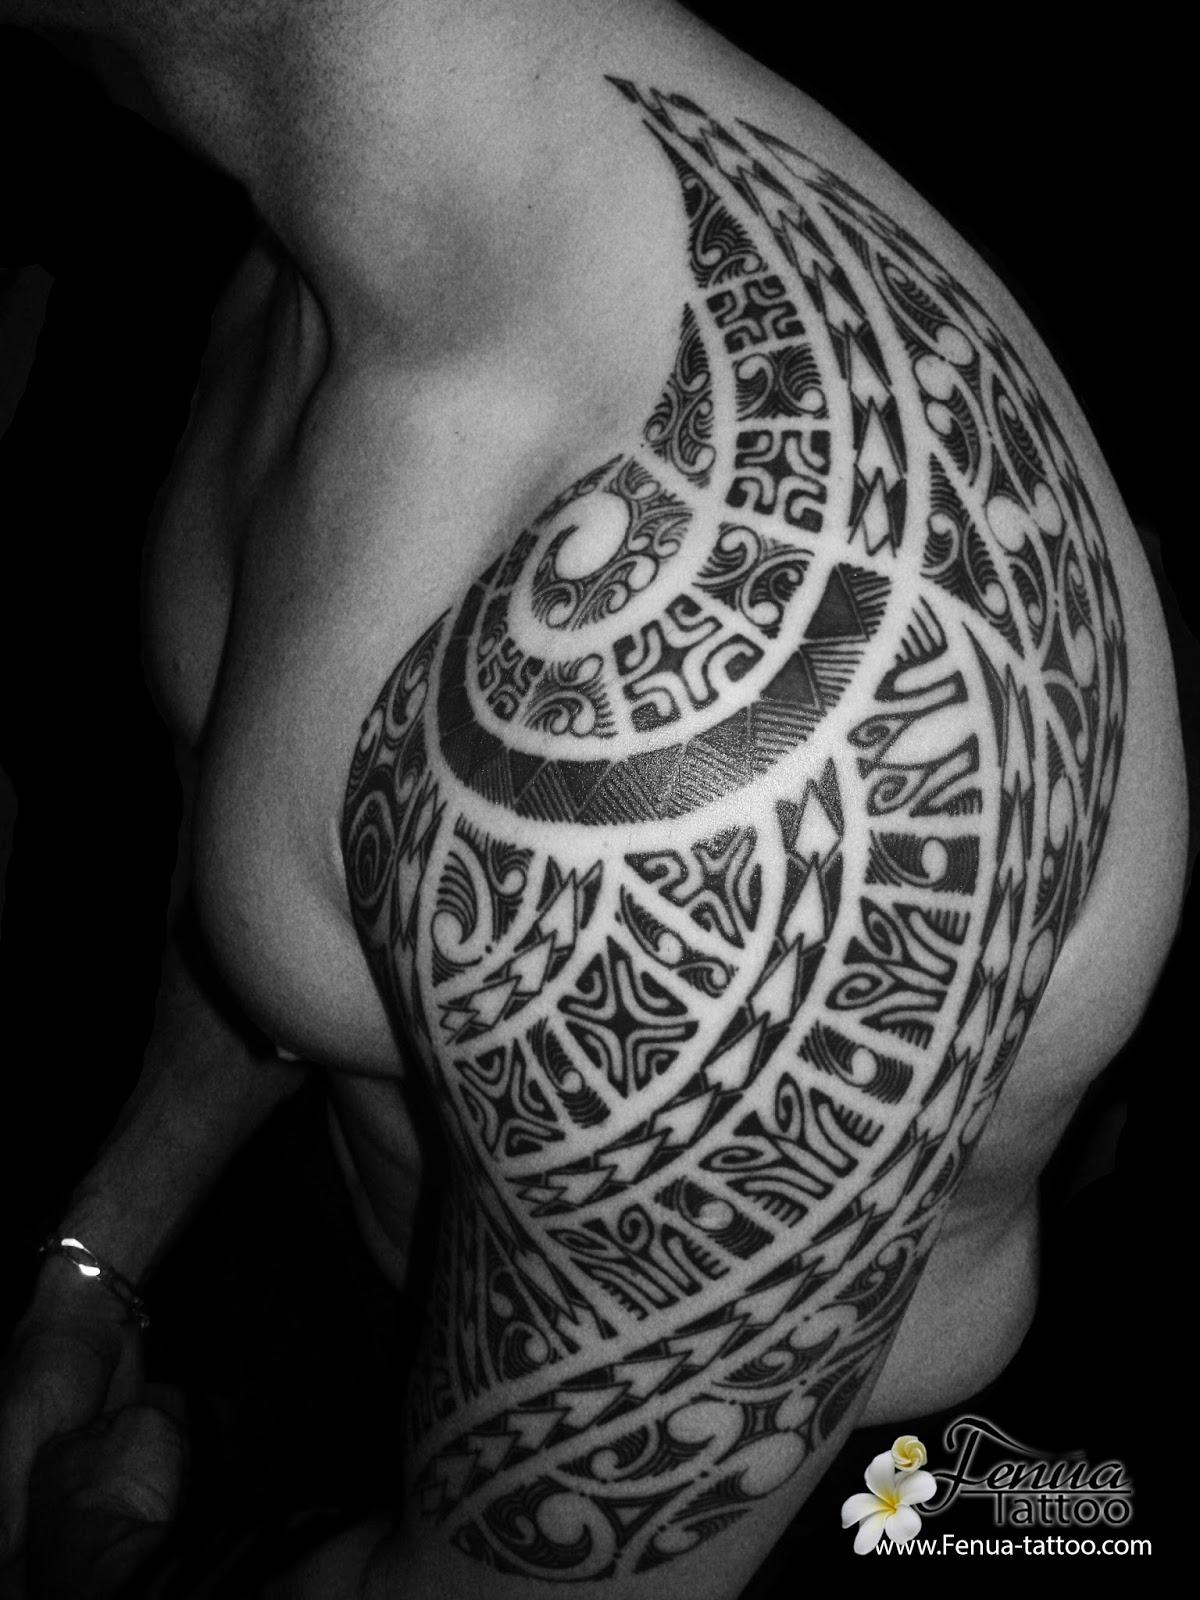 Tatouage Polynésien Tahiti Tattoo Spécialiste Du Tatouage